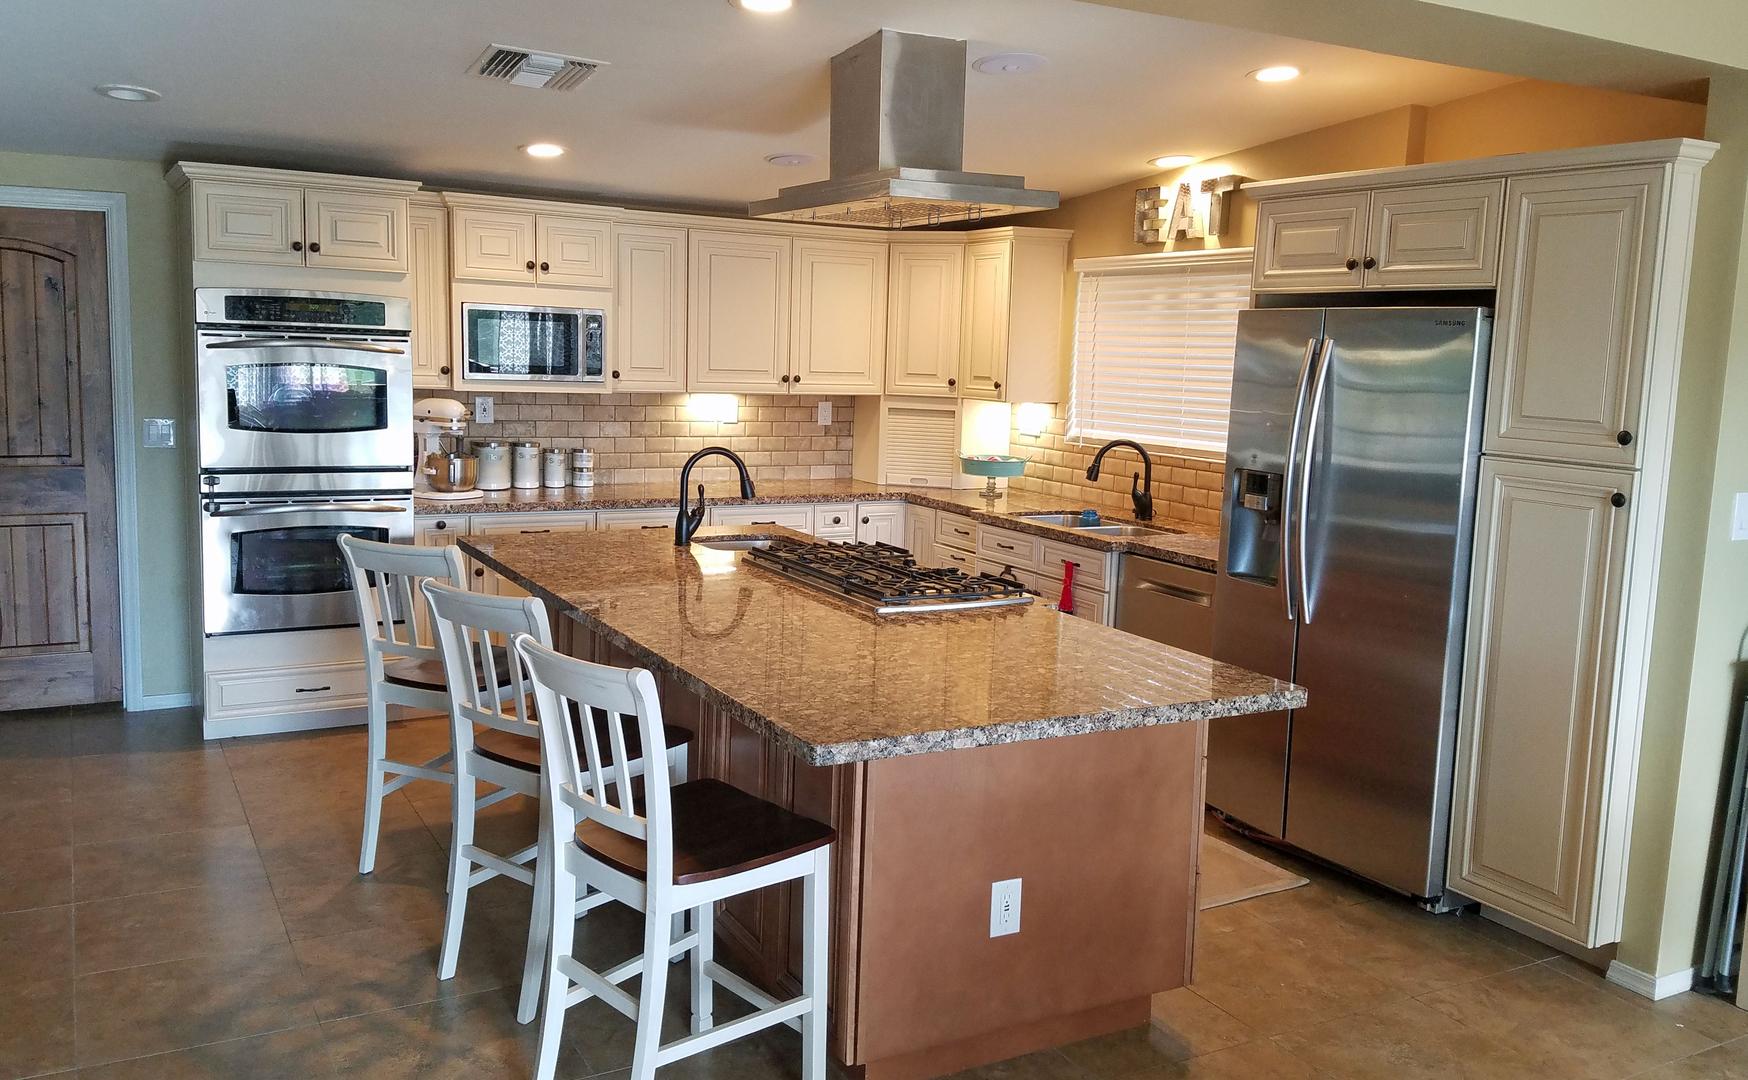 Kitchen Remodeling Tucson Az Residential Remodel And Renovation